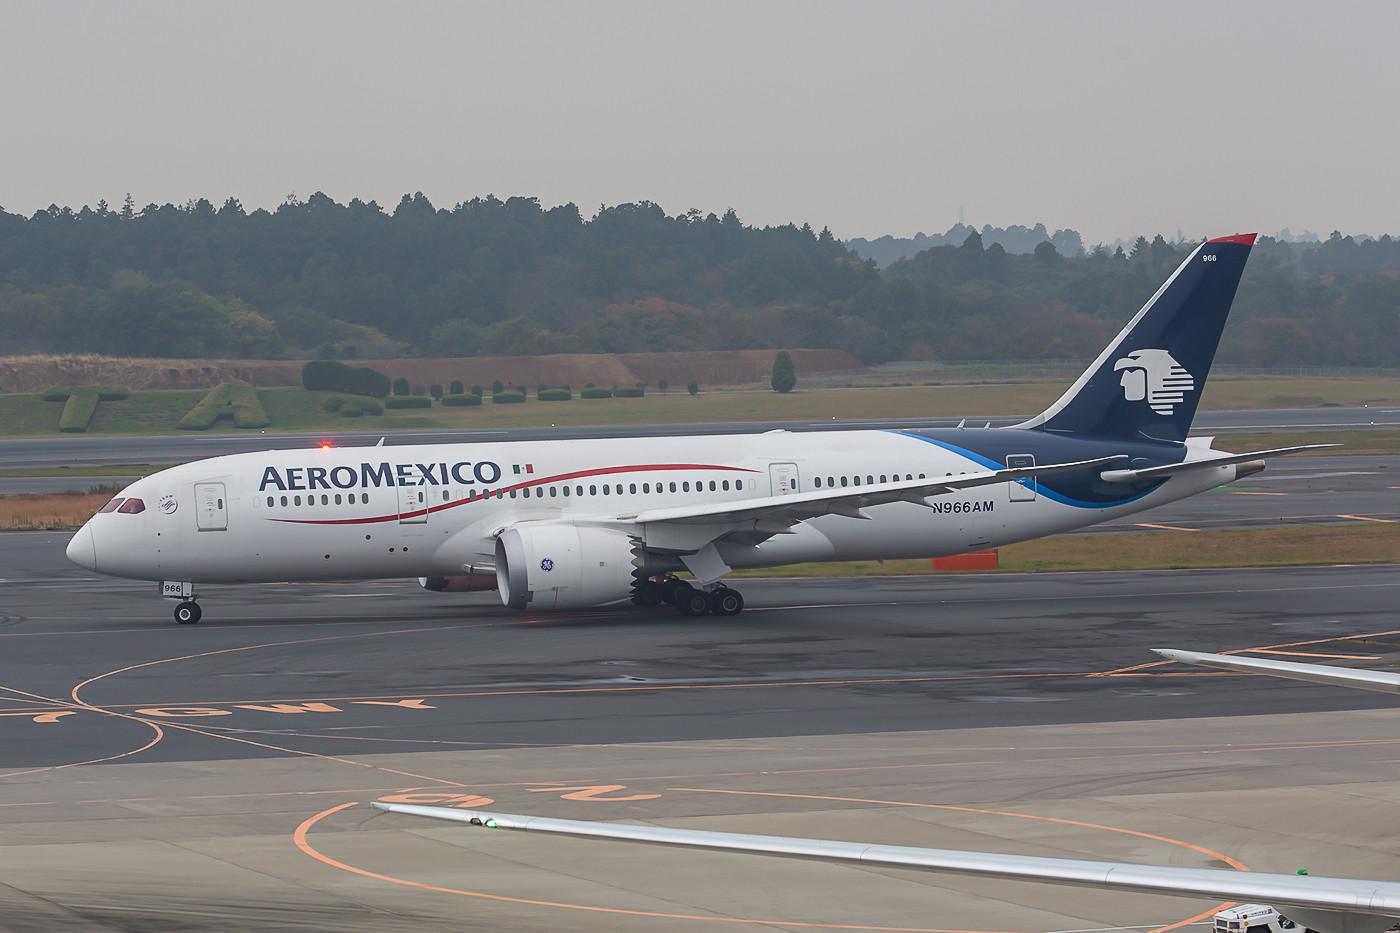 Der Dramliner der Aeromexico verbindet Tokyo mit Mexico-City via Tijuana.